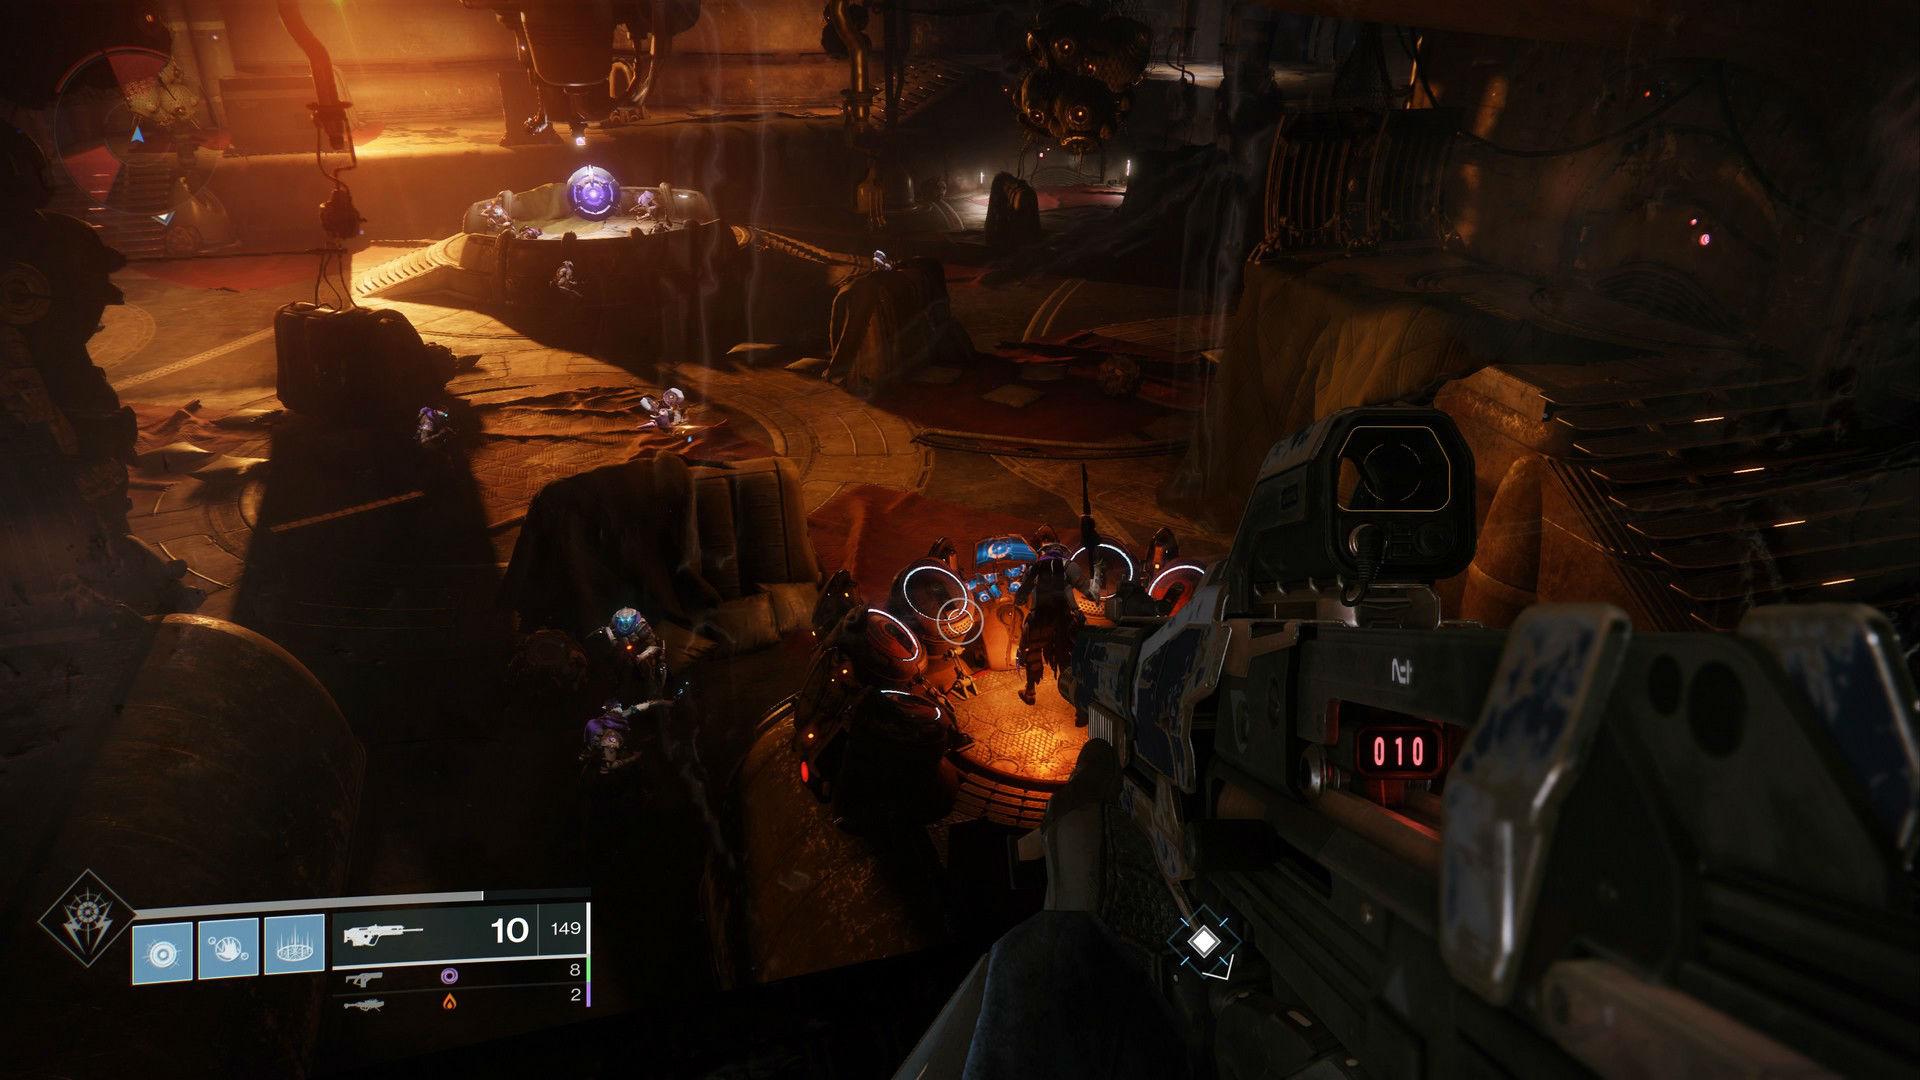 Destiny 2's Refer-A-Friend program gets updated for Forsaken screenshot